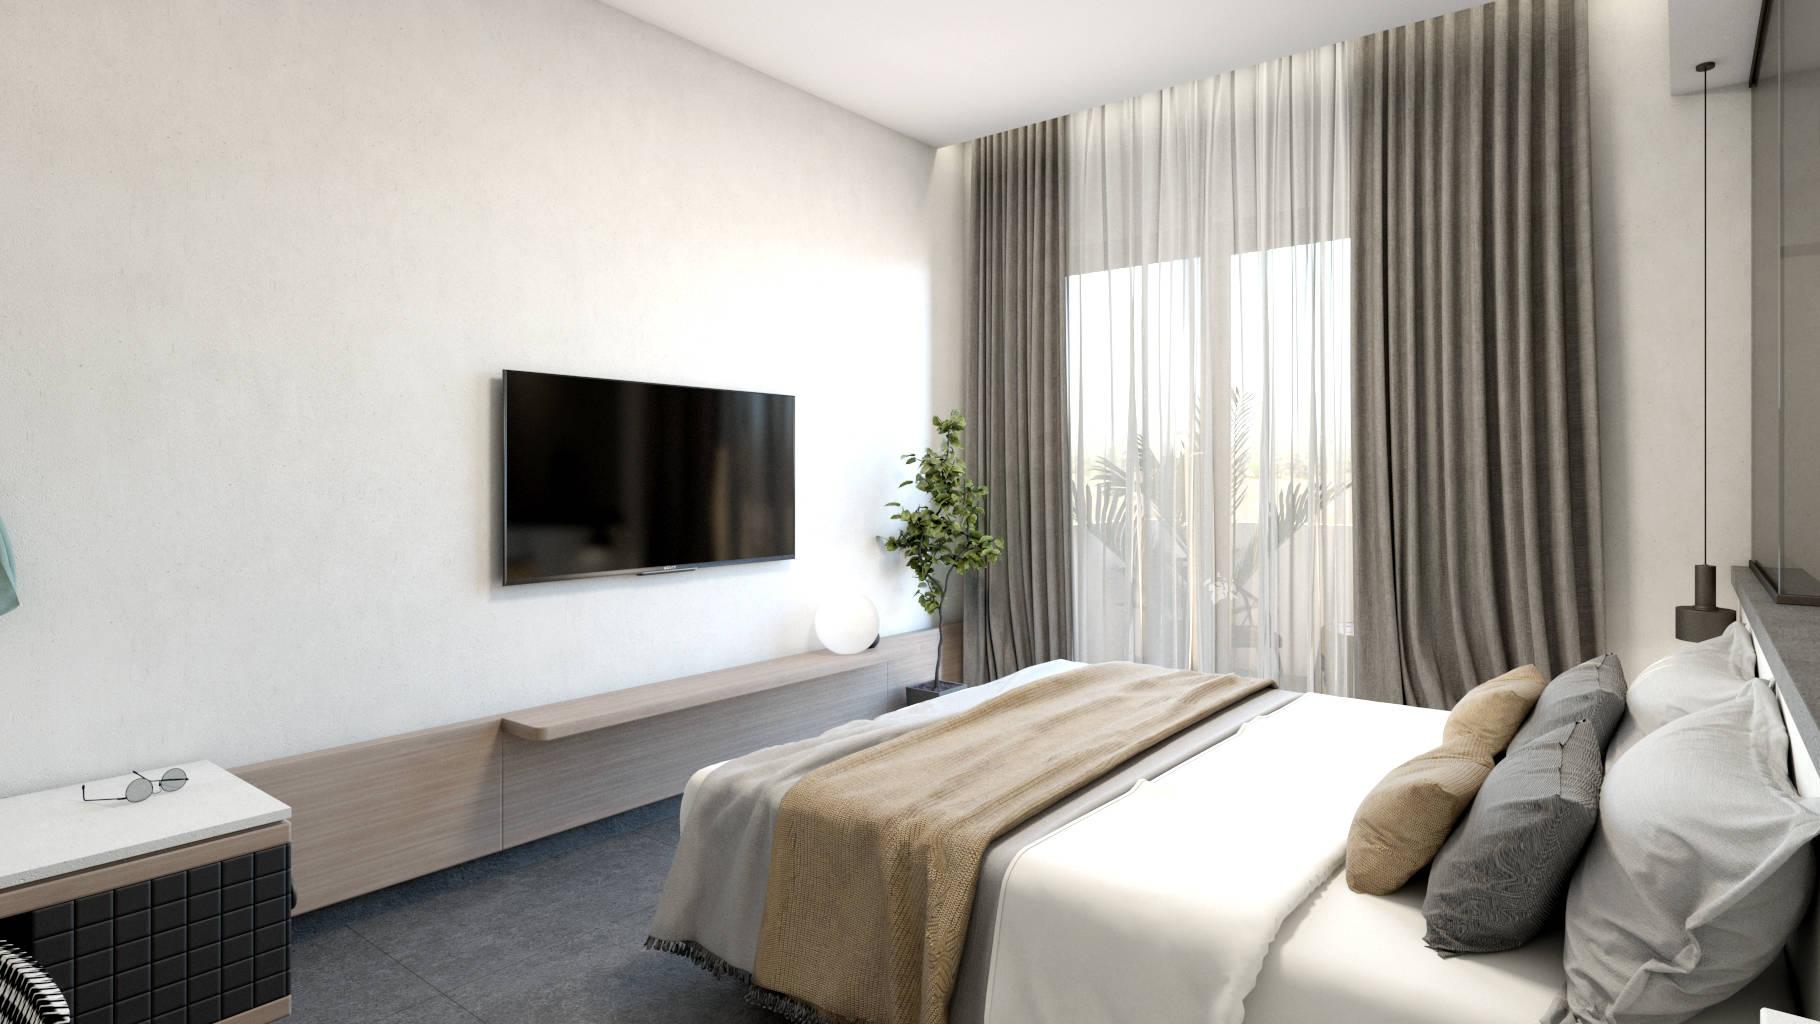 Double hotel room, interior design, bed. Δίκλινο δωμάτιο ξενοδοχείου, κρεβάτι.